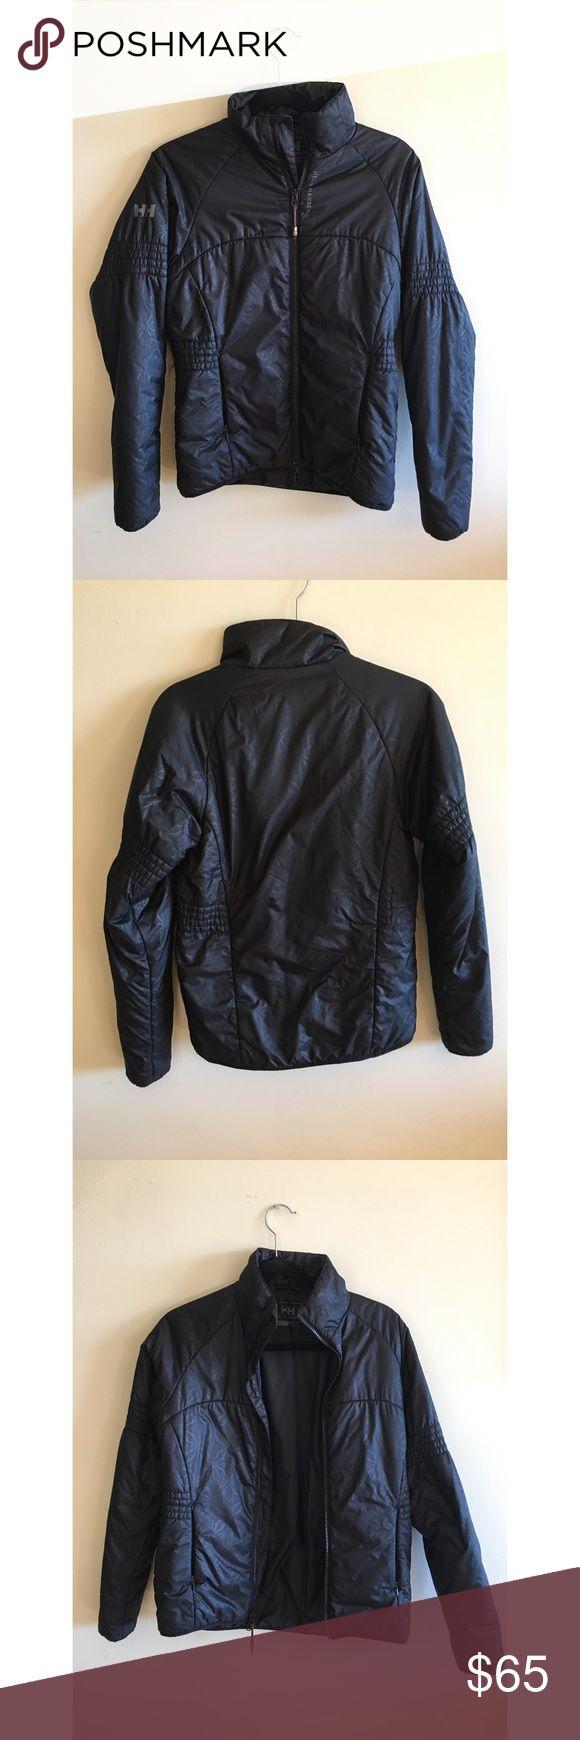 Helly Hansen Jacket Helly Hansen black puffy jacket women's size small. Gently used. Helly Hansen Jackets & Coats Puffers